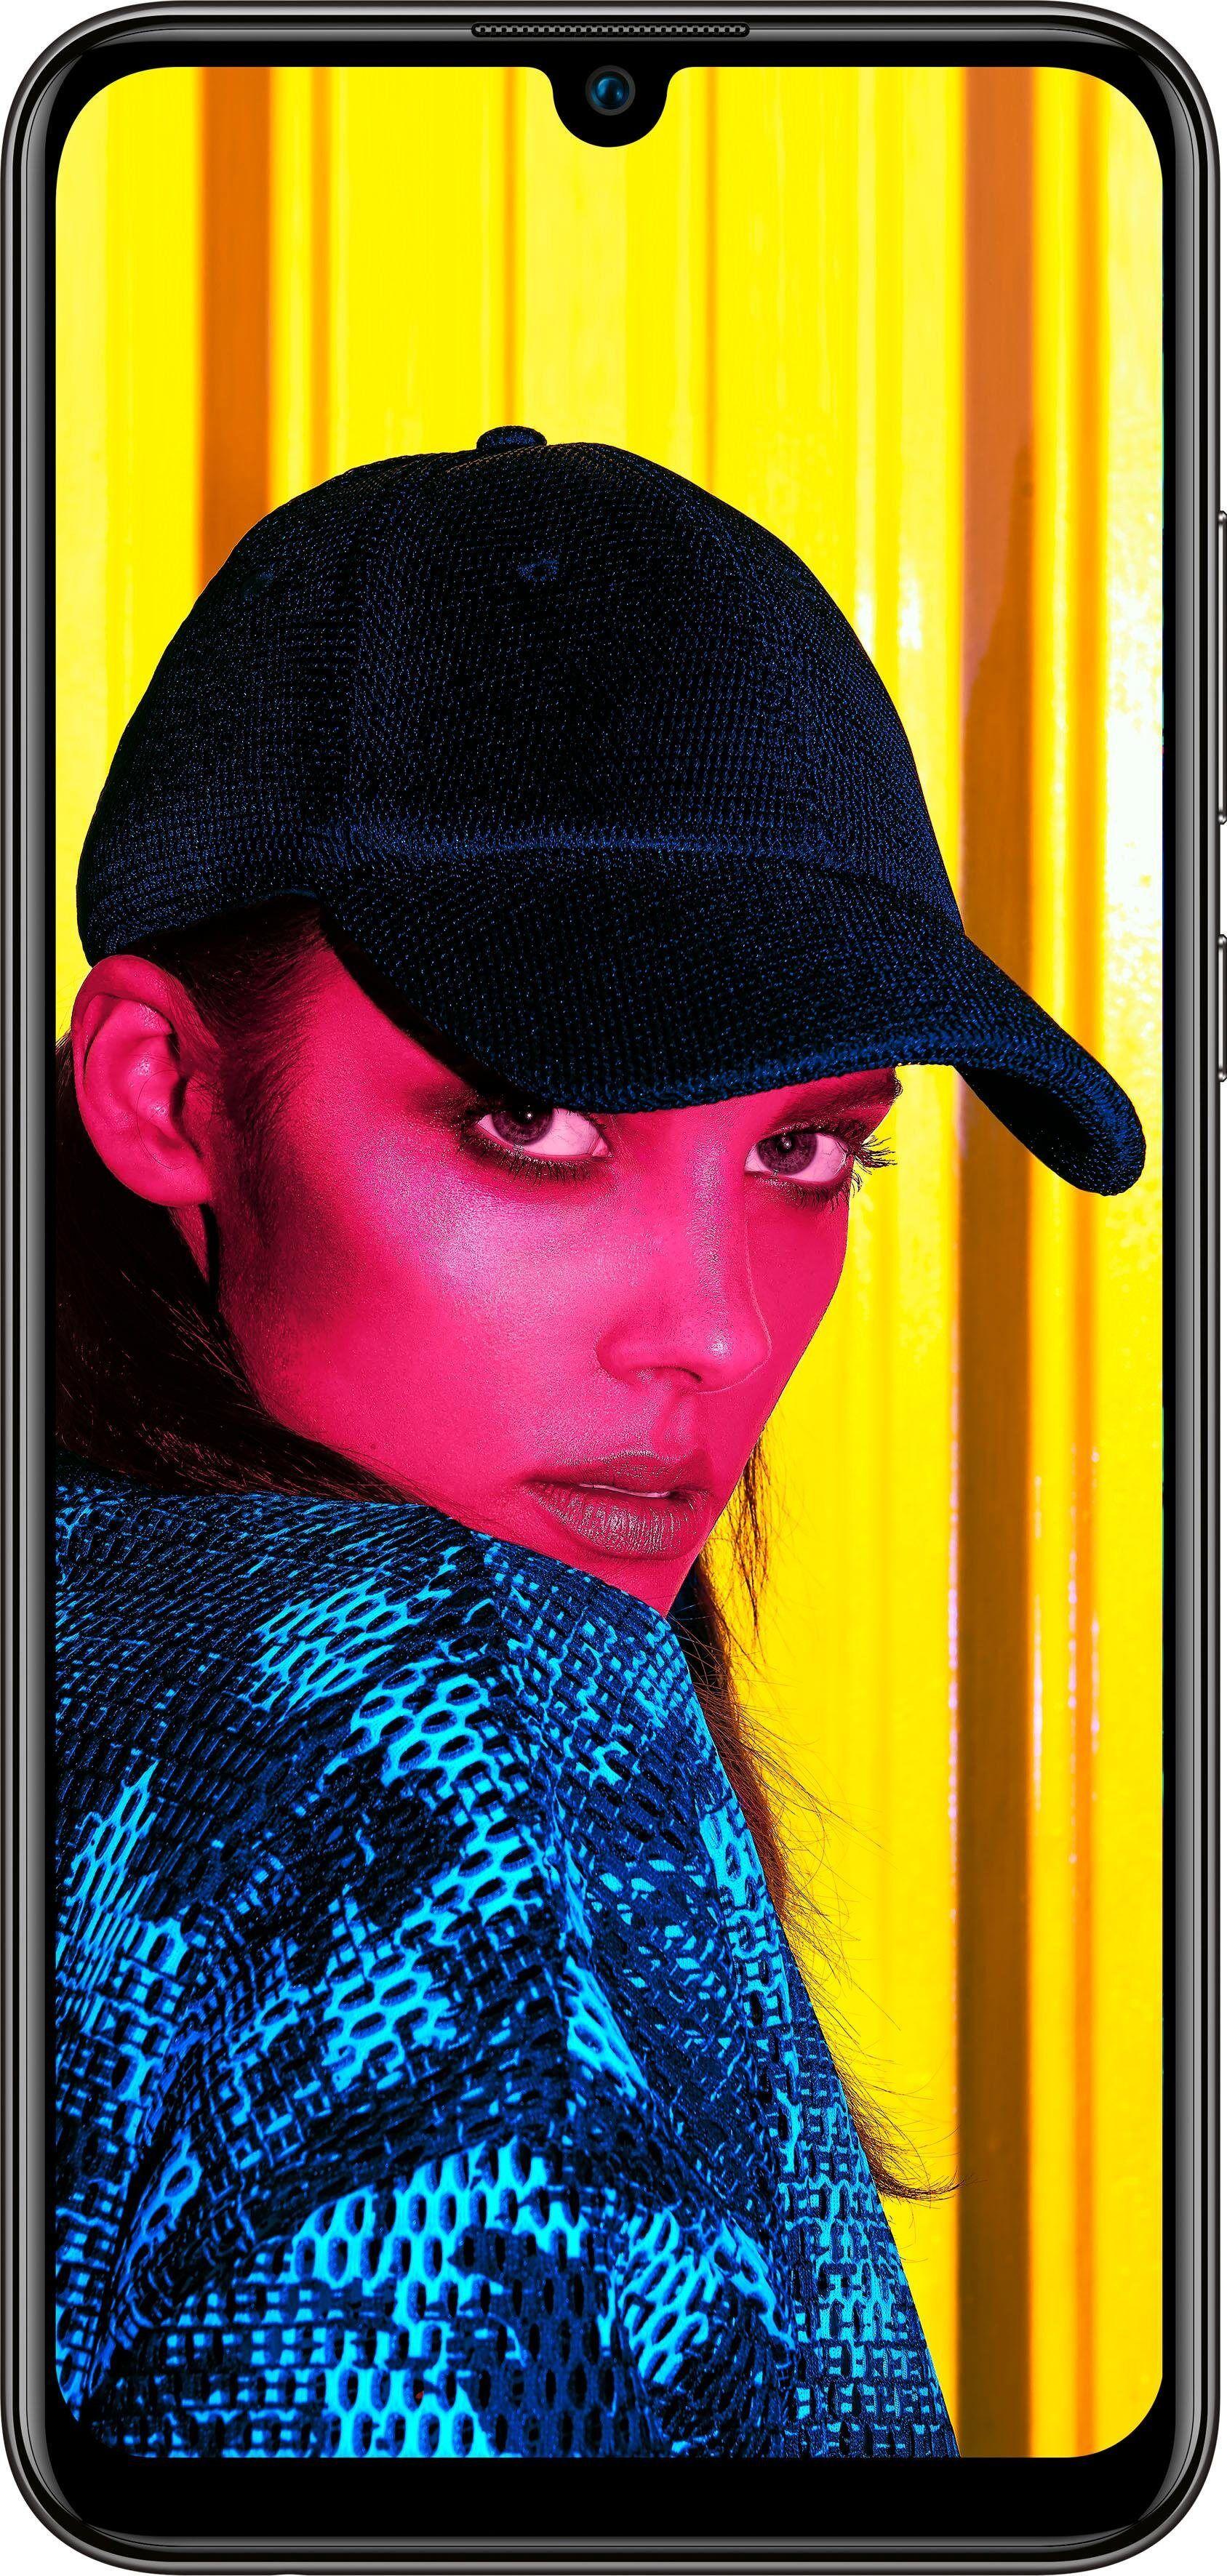 Huawei P smart 2019 Smartphone (15,77 cm/6,2 Zoll, 64 GB Speicherplatz, 13 MP Kamera), Midnight Black